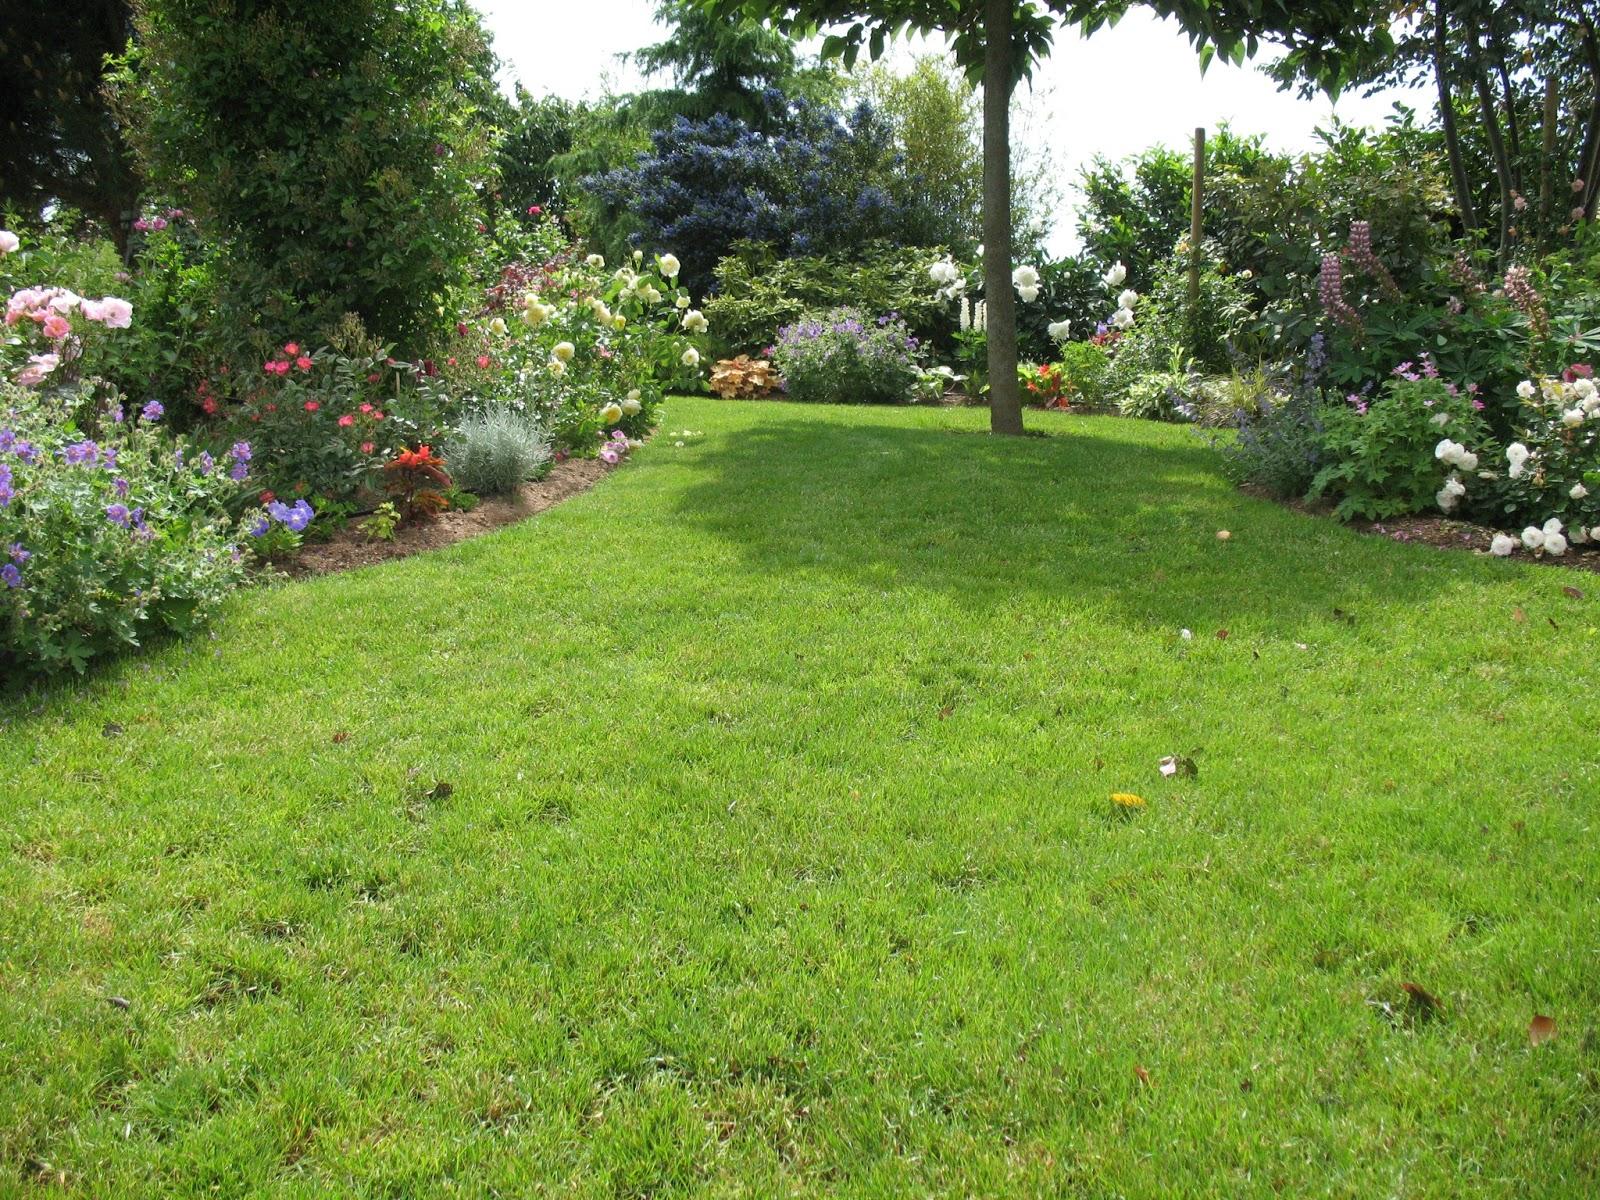 roses du jardin ch neland arbustes floraison estivale. Black Bedroom Furniture Sets. Home Design Ideas